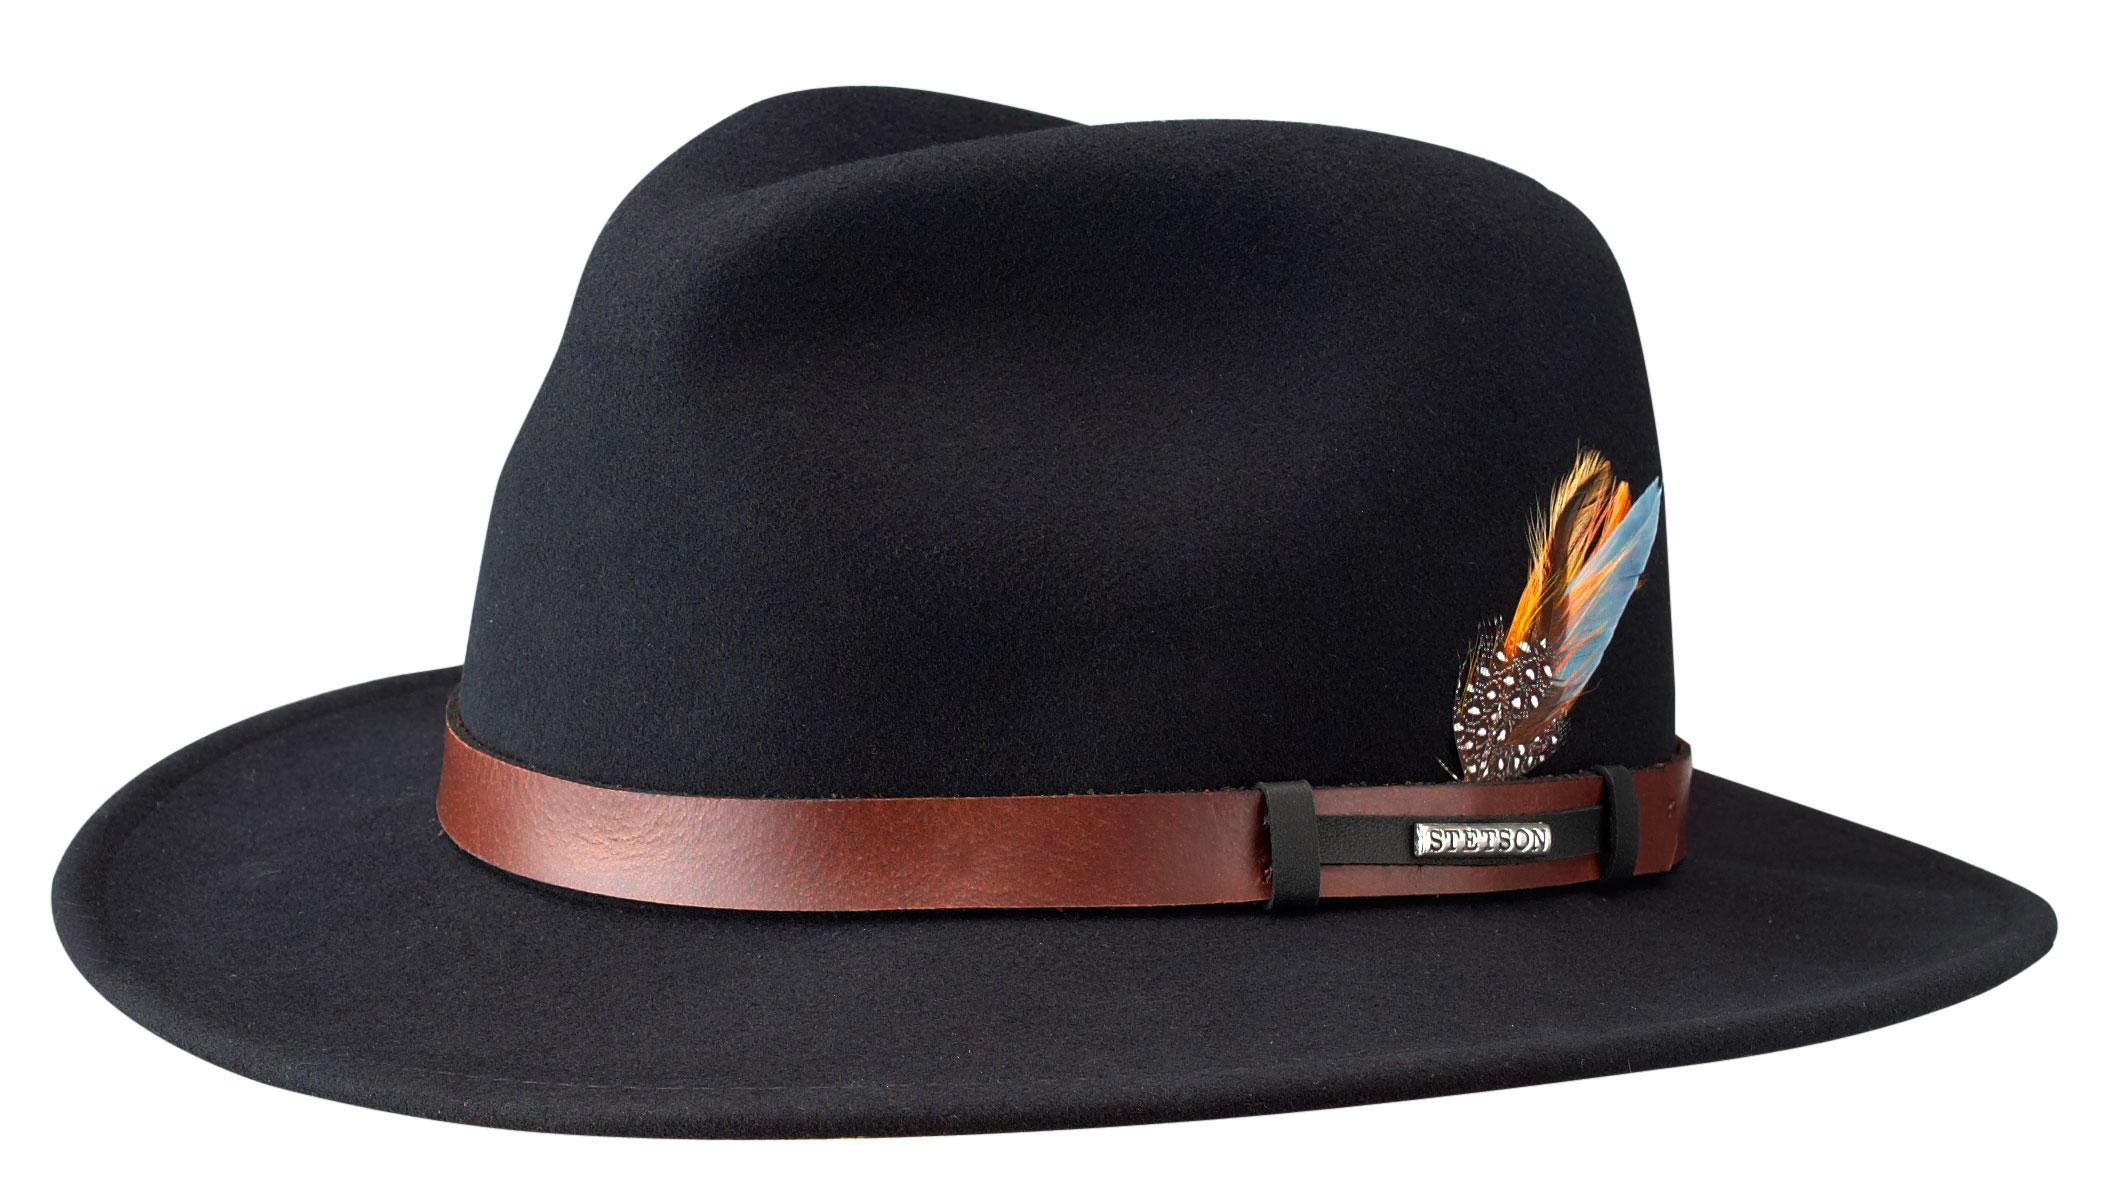 Chapeau malléable Sardis Stetson noir - Kausia d602a7ea56c